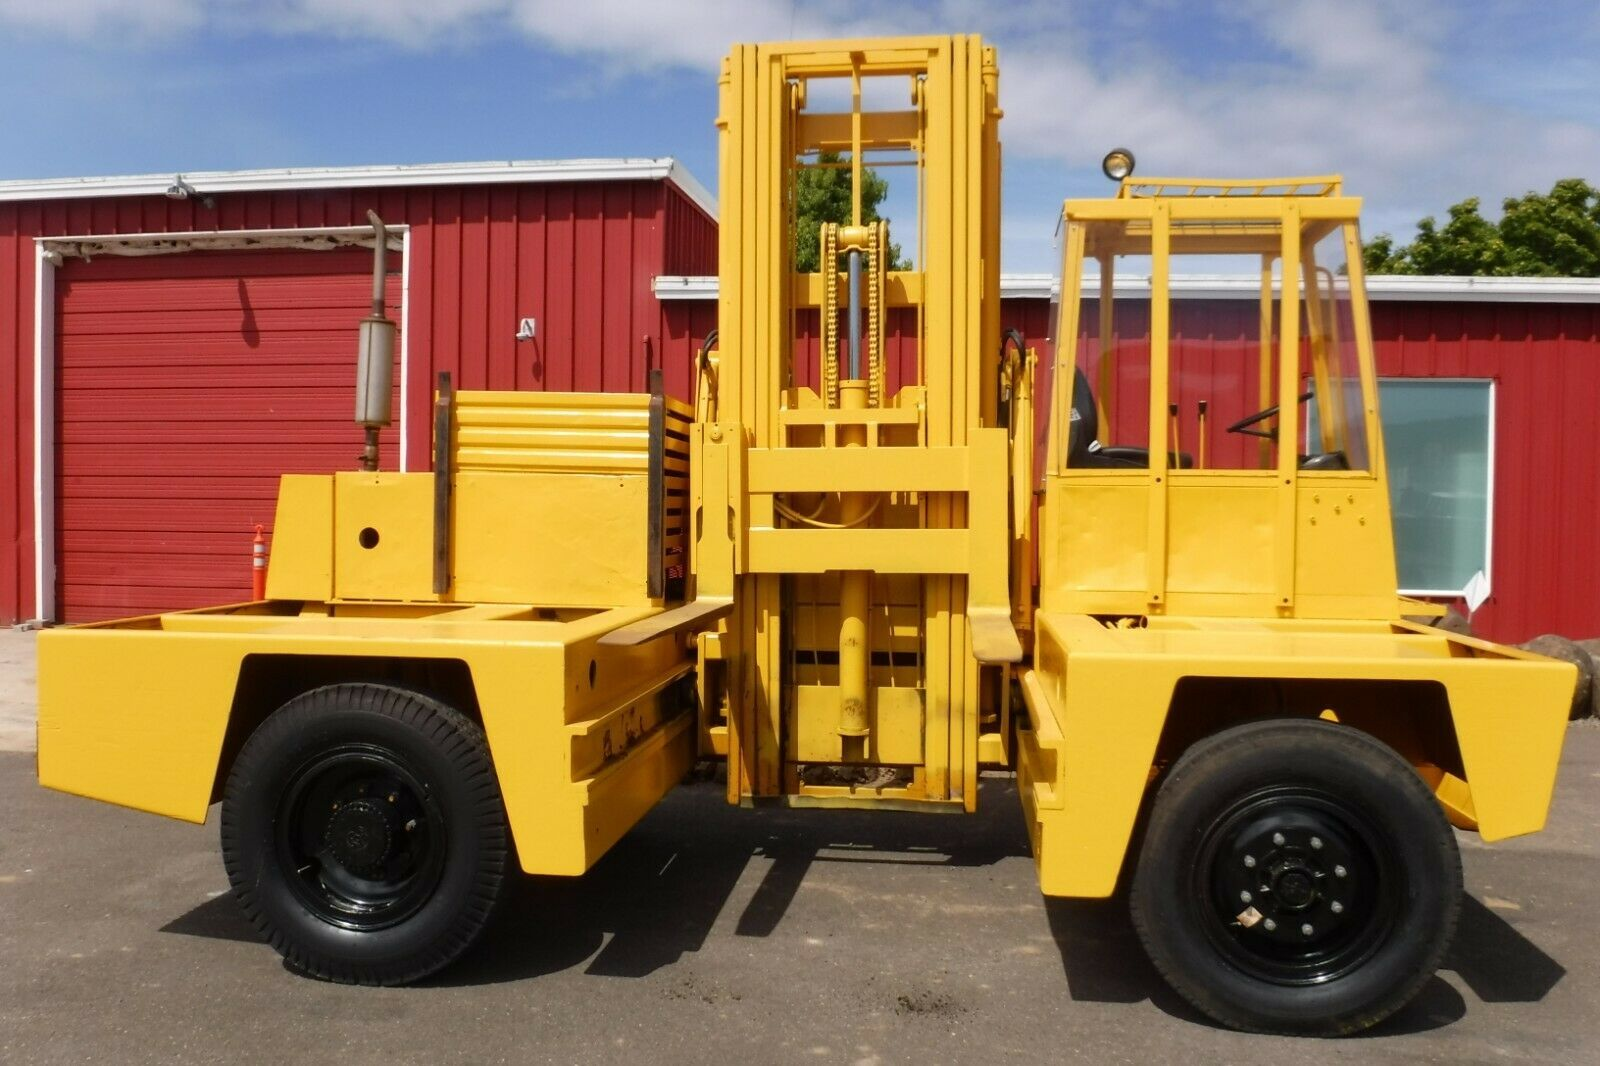 Diesel Forklift Diesel, Lifted trucks, Price comparison